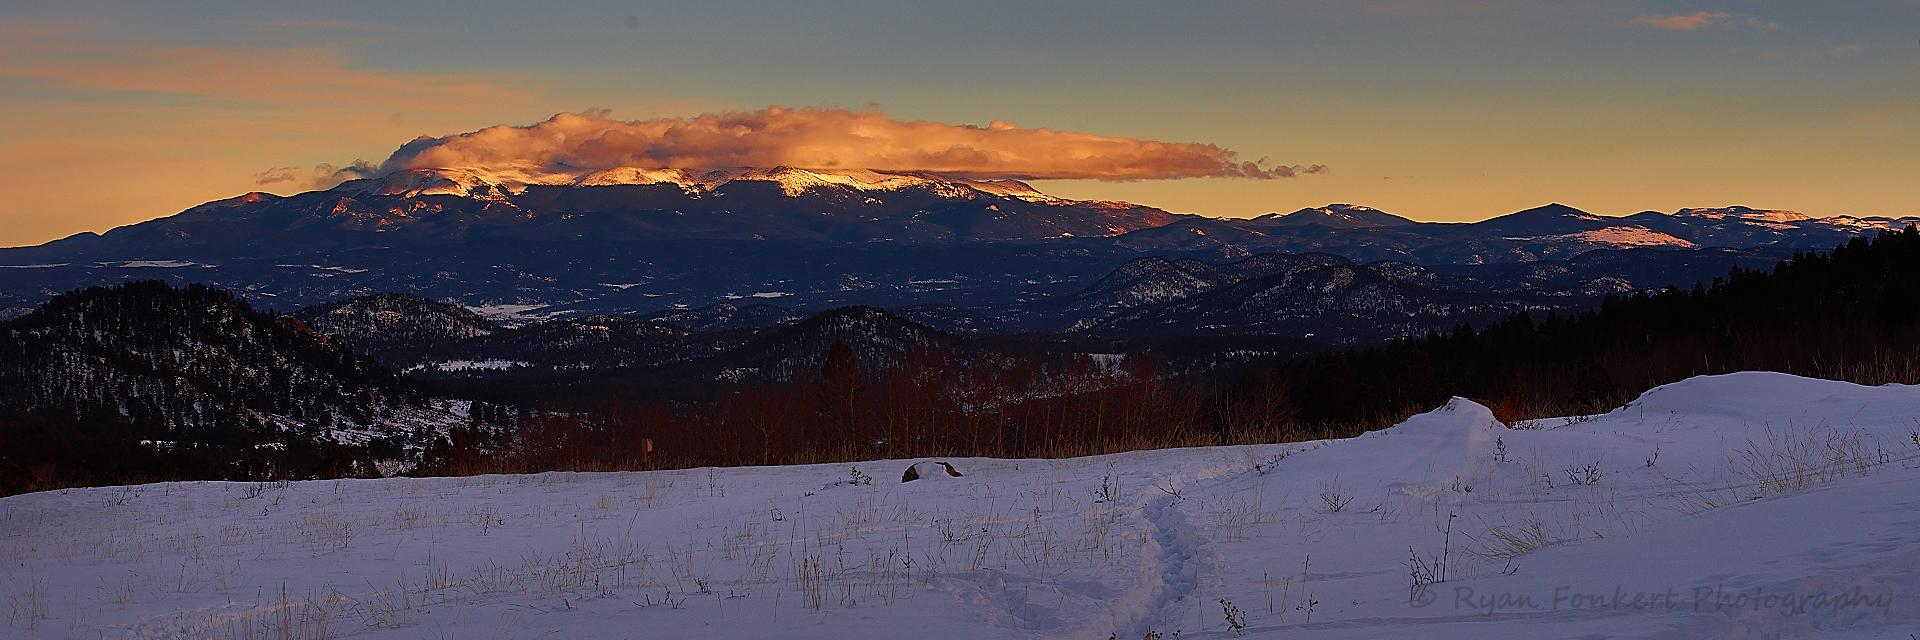 Sunset Clouds On Pikes Peak